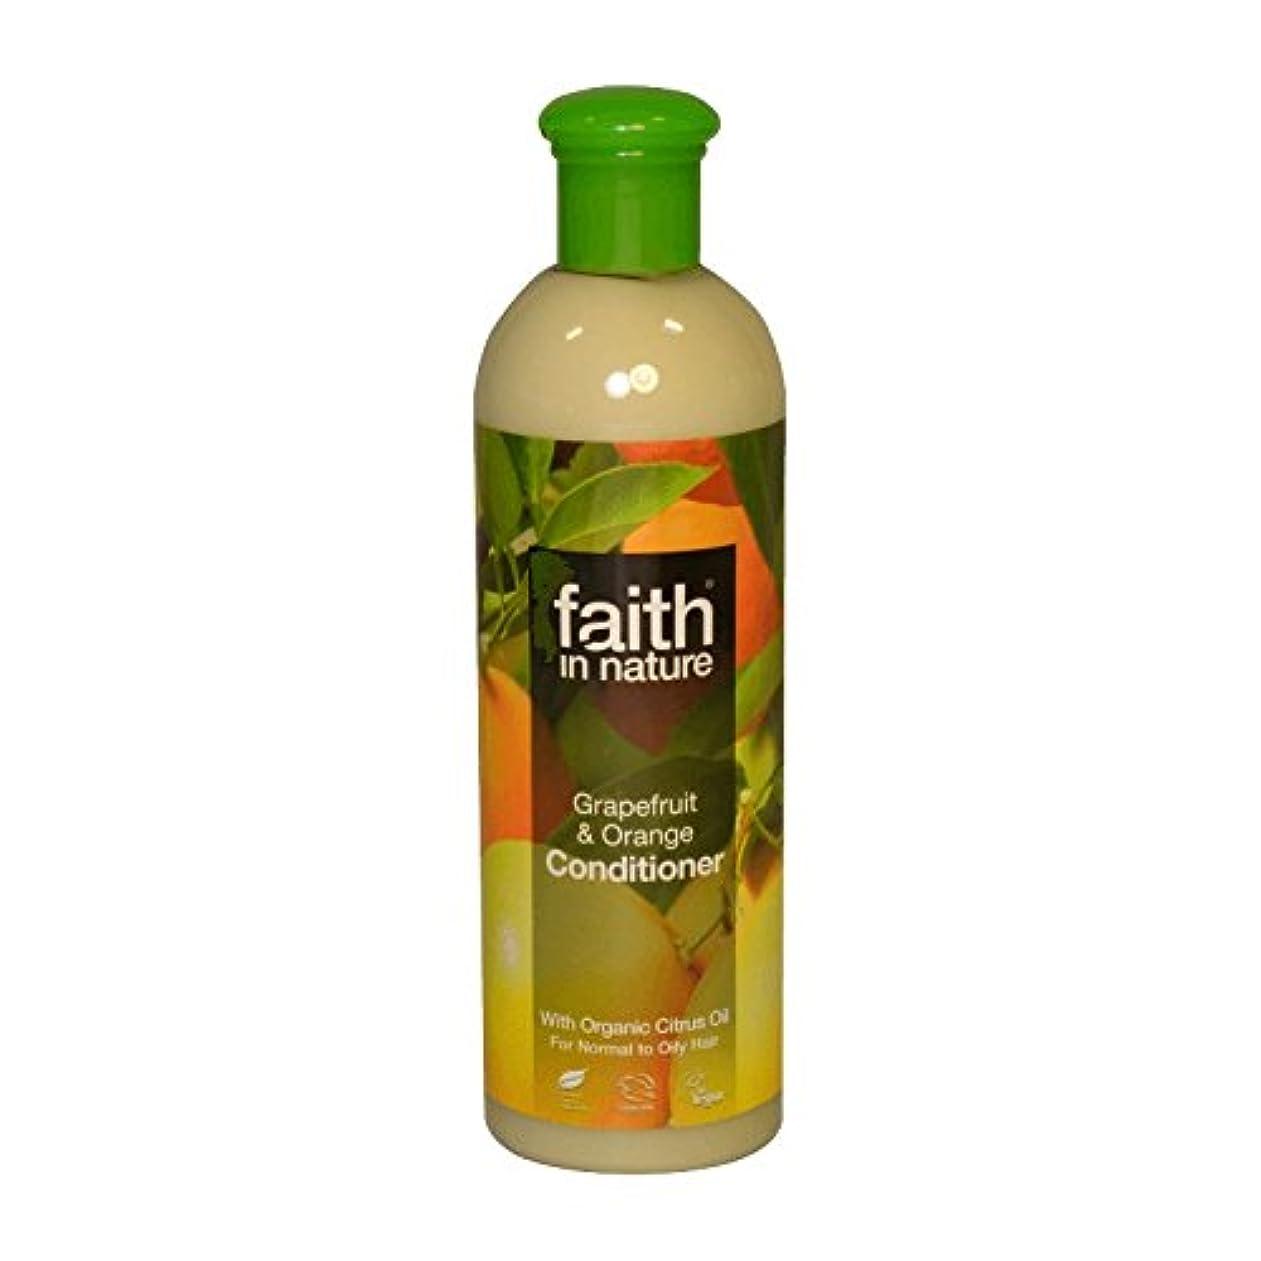 Faith in Nature Grapefruit & Orange Conditioner 400ml (Pack of 2) - 自然グレープフルーツ&オレンジコンディショナー400ミリリットルの信仰 (x2) [...